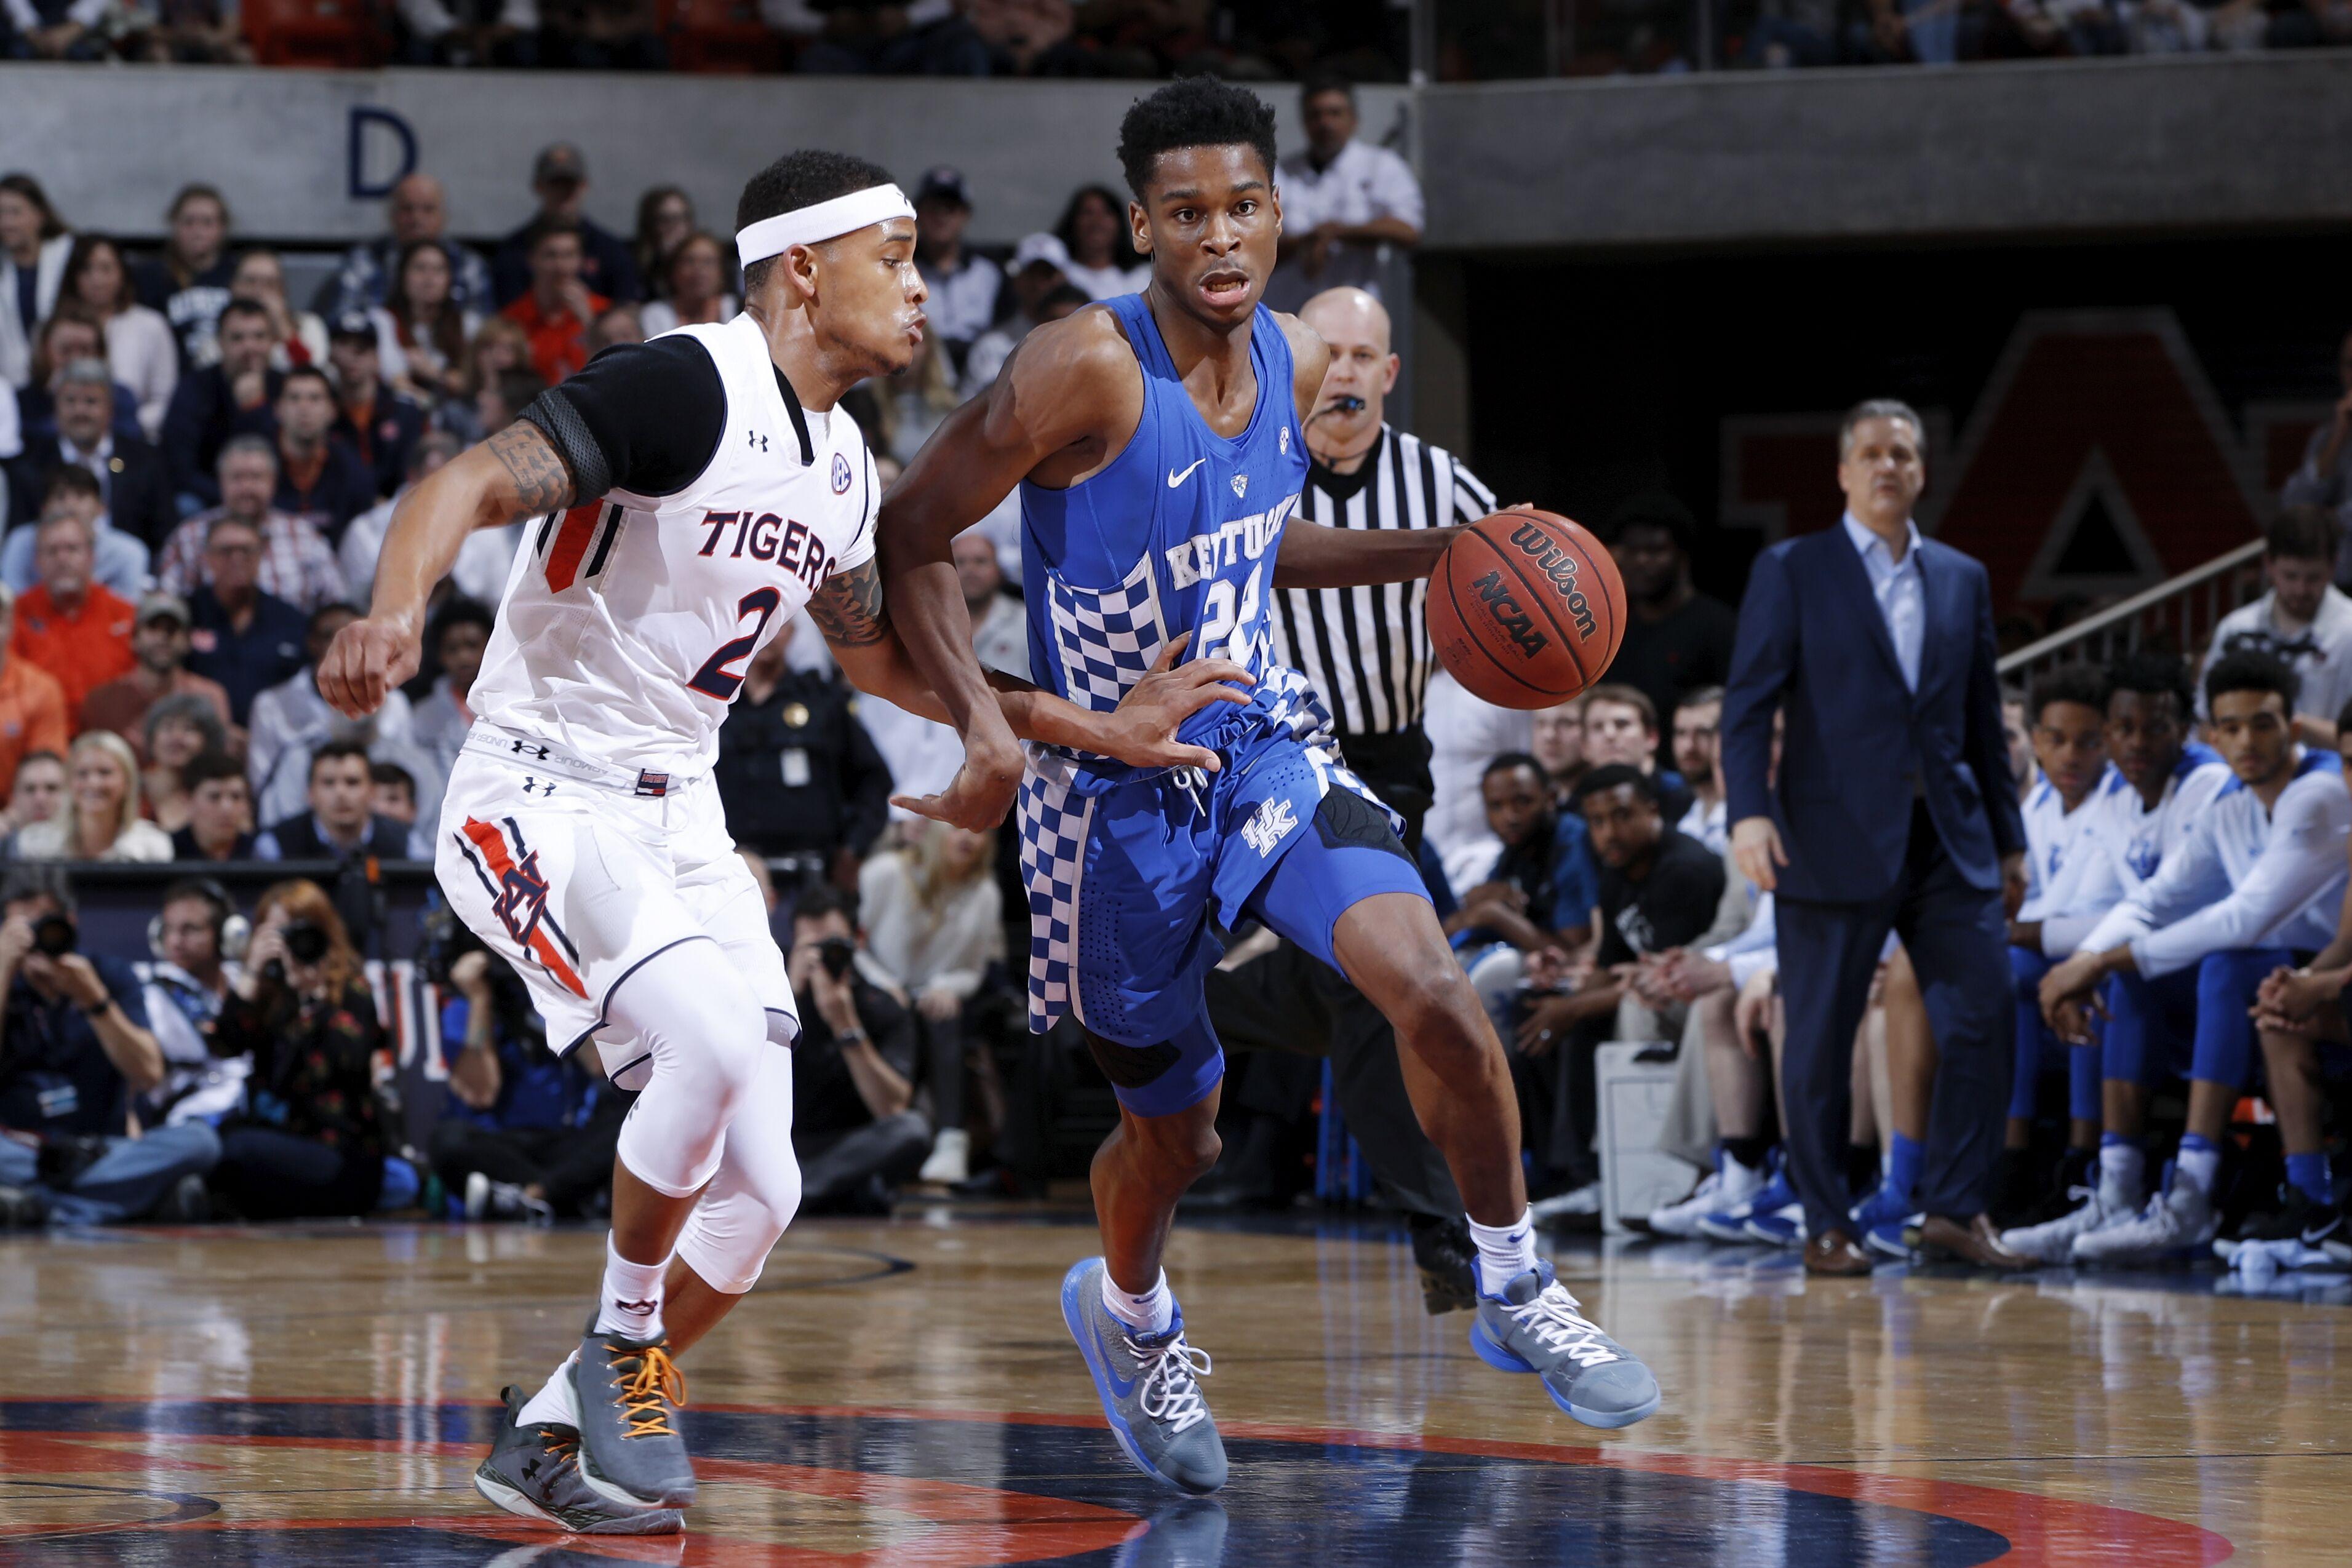 Kentucky Basketball 3 Concerns After Wildcats Home Loss: Kentucky Basketball: 5 Rushed Reactions Vs Auburn